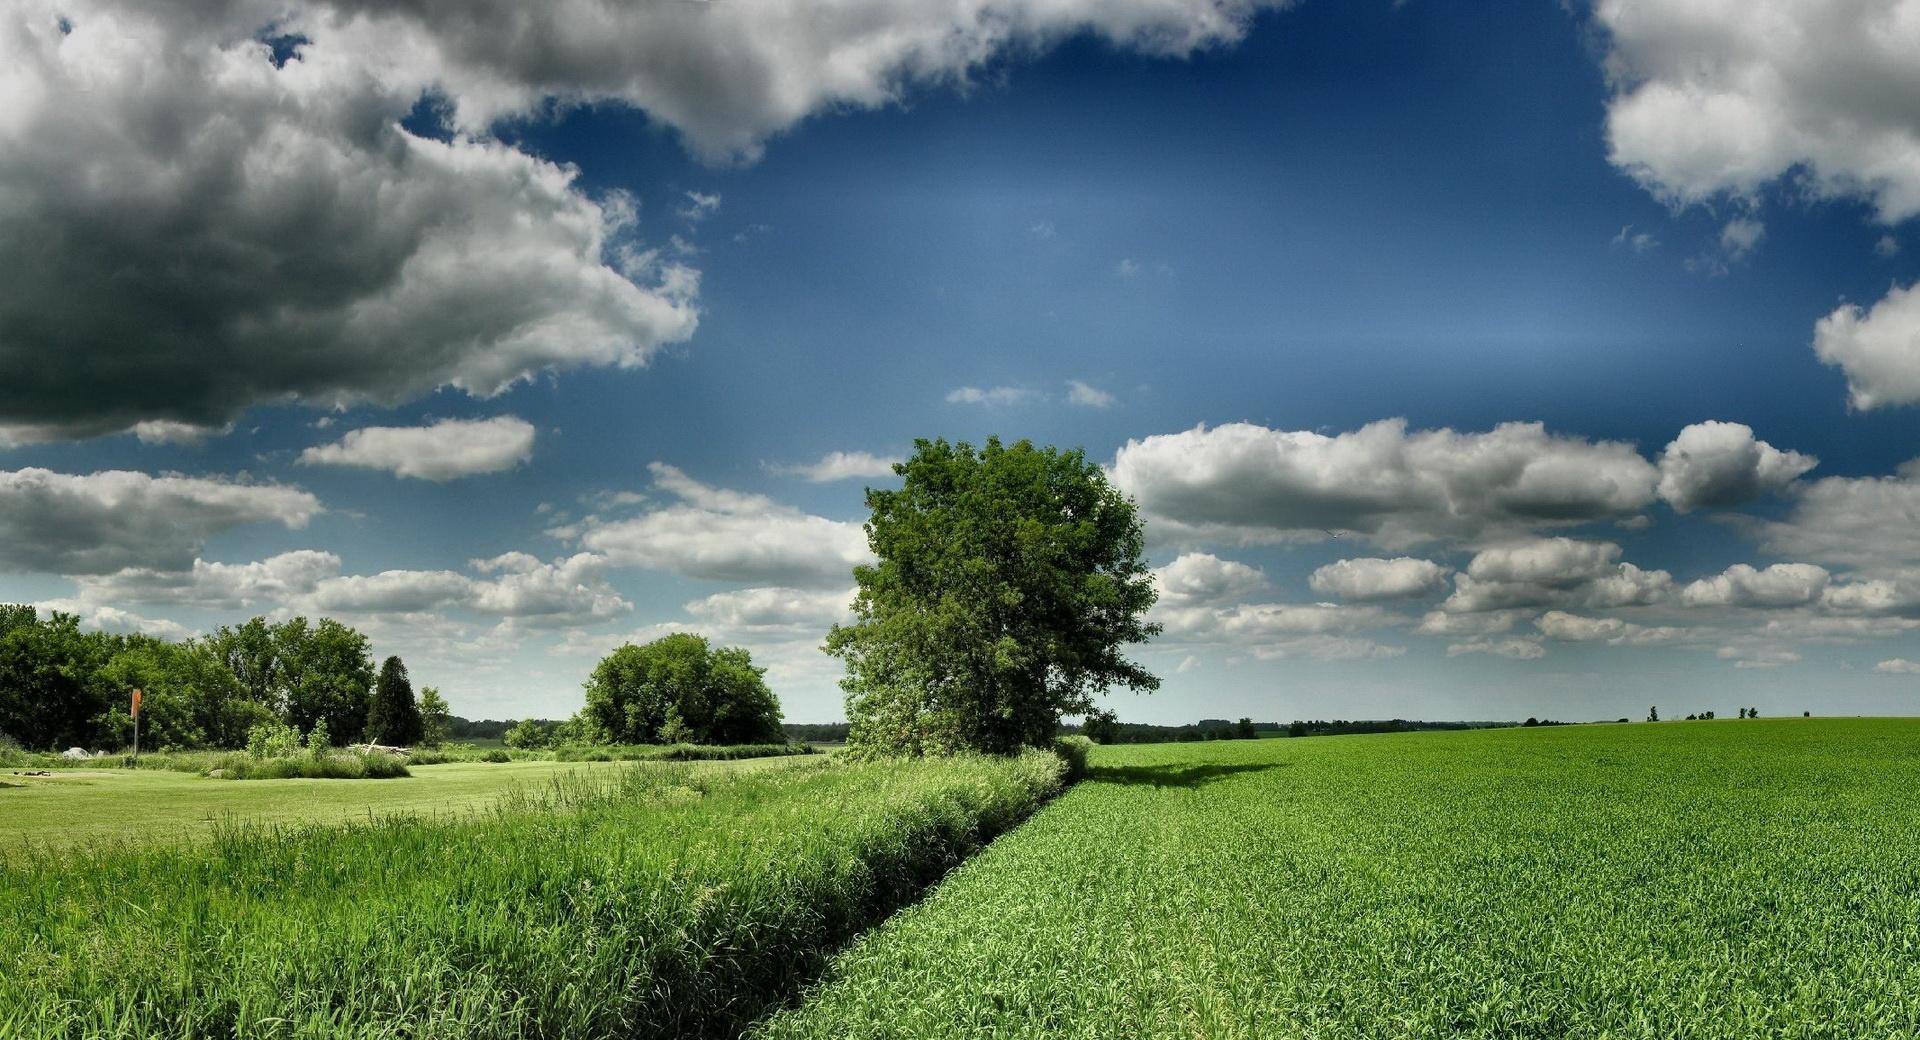 Field Tree Cloud Blue Sky wallpapers HD quality